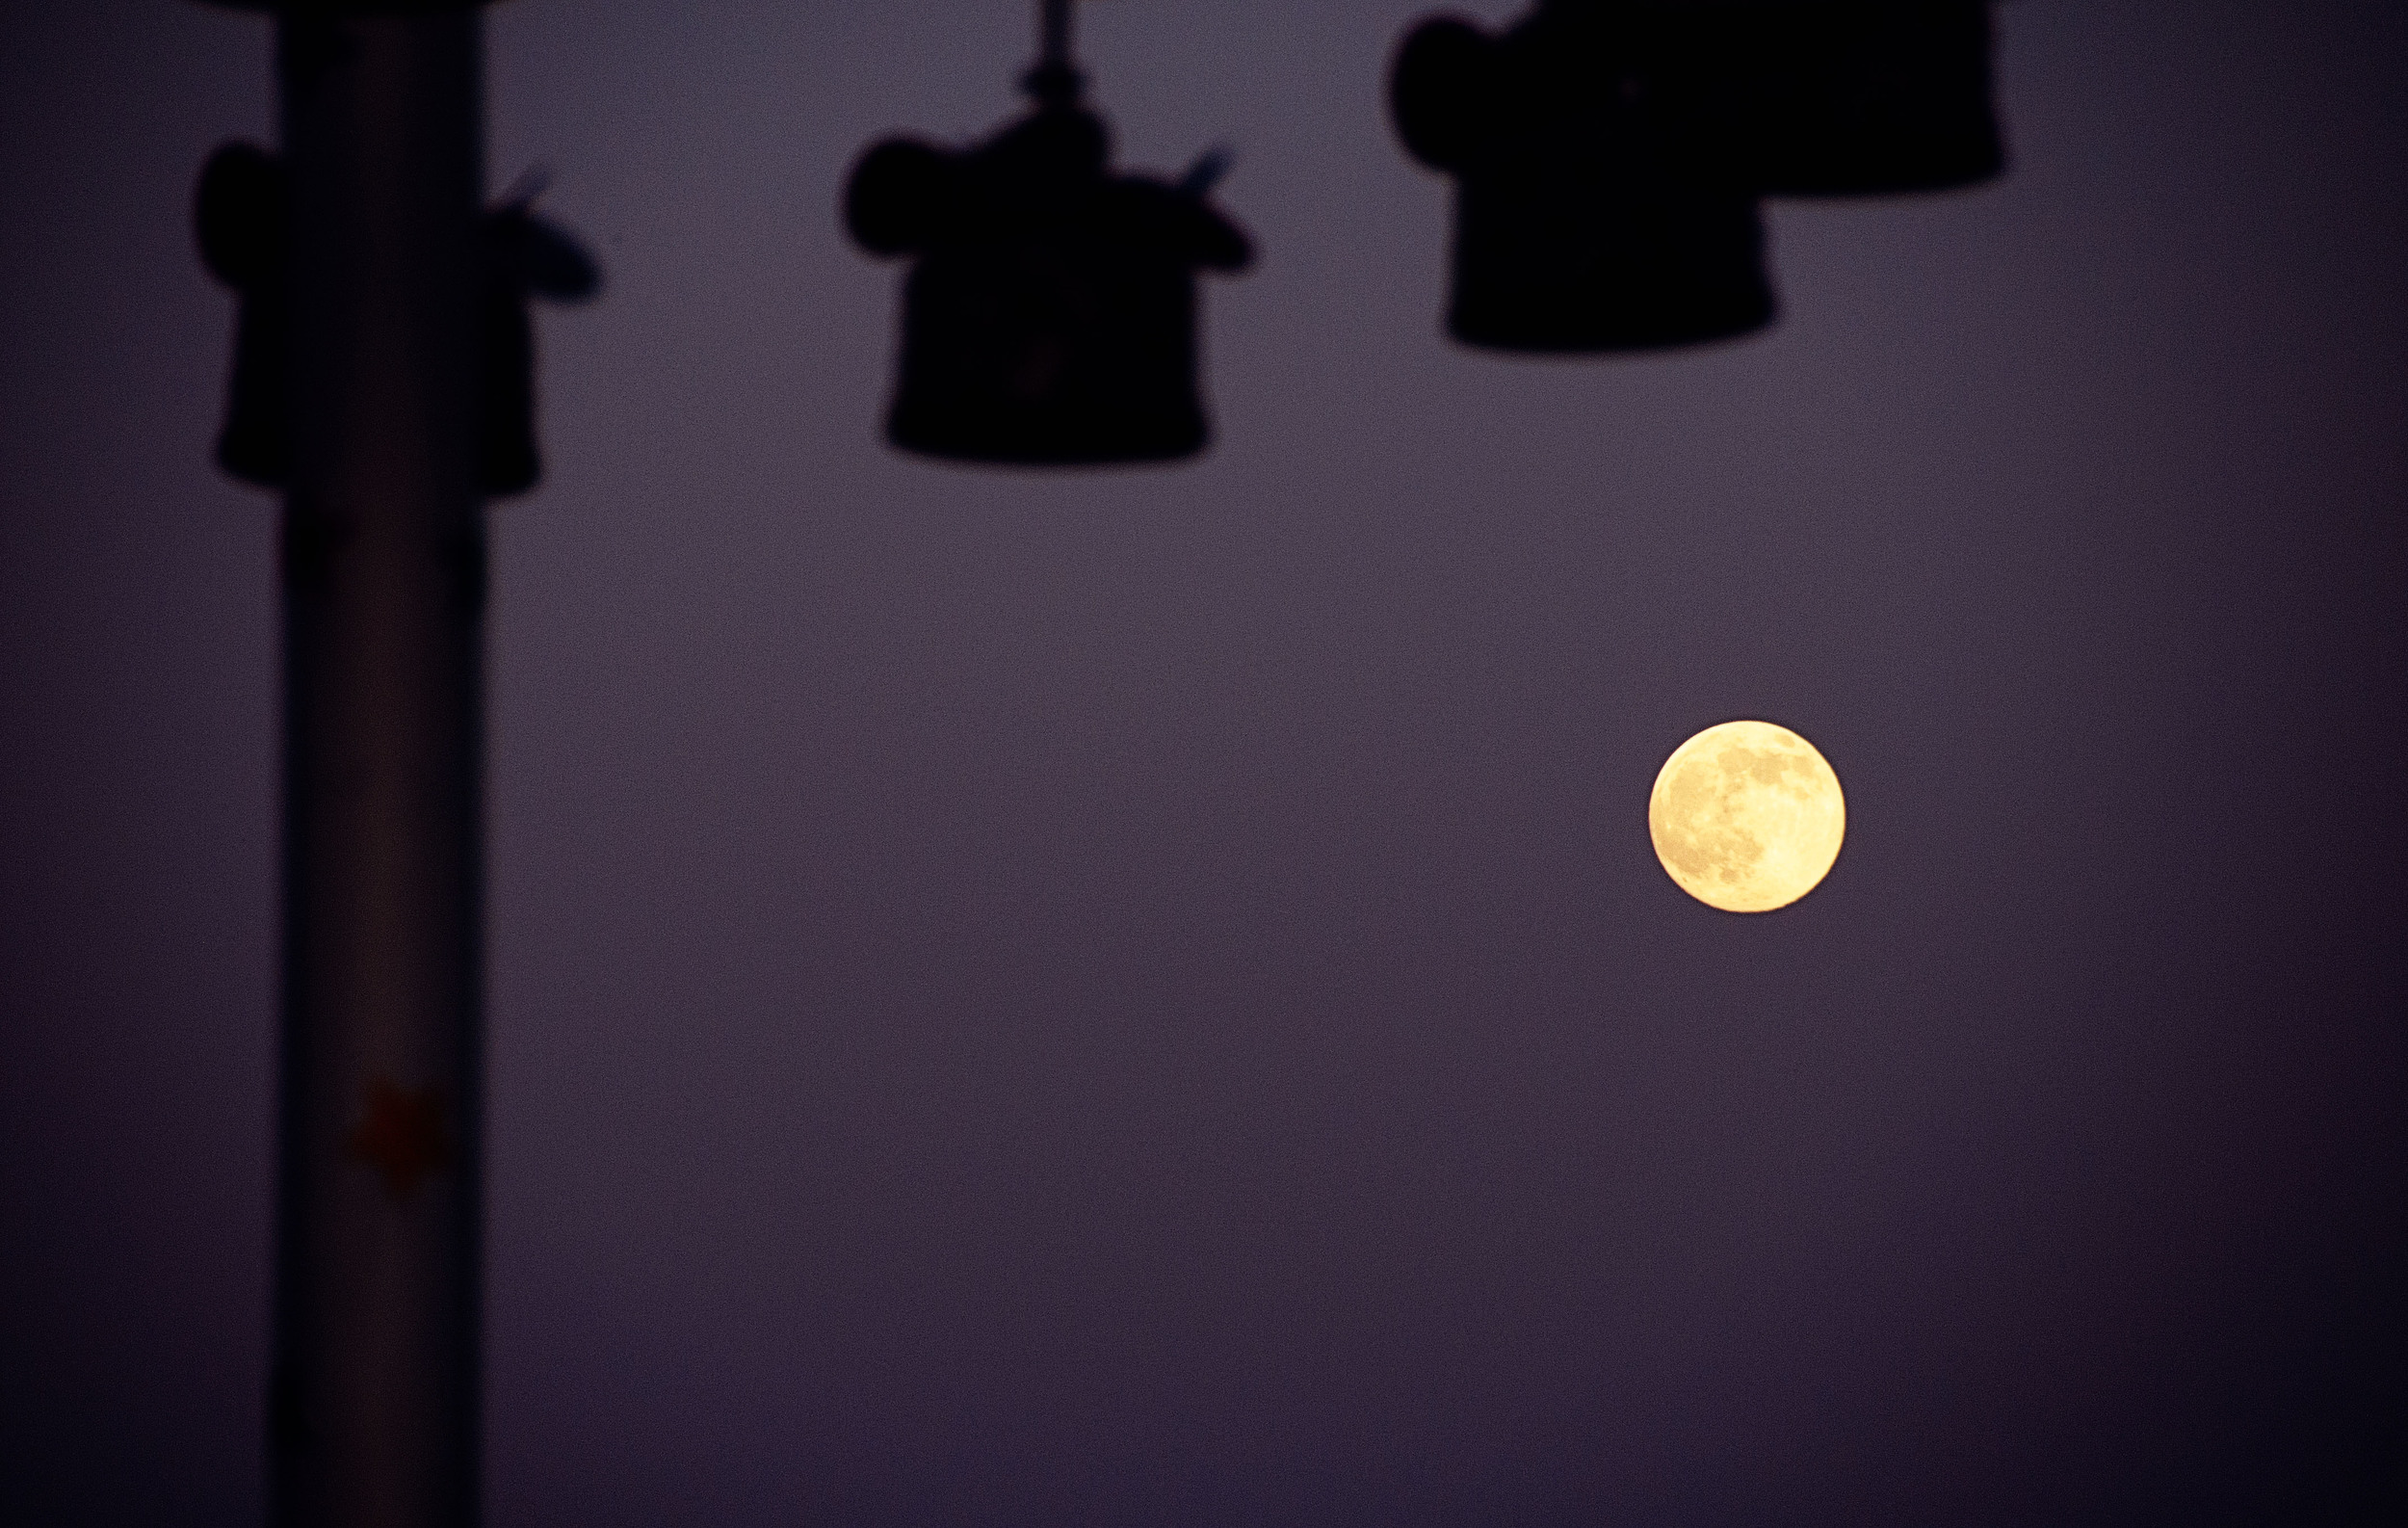 Fearrington Full moon2